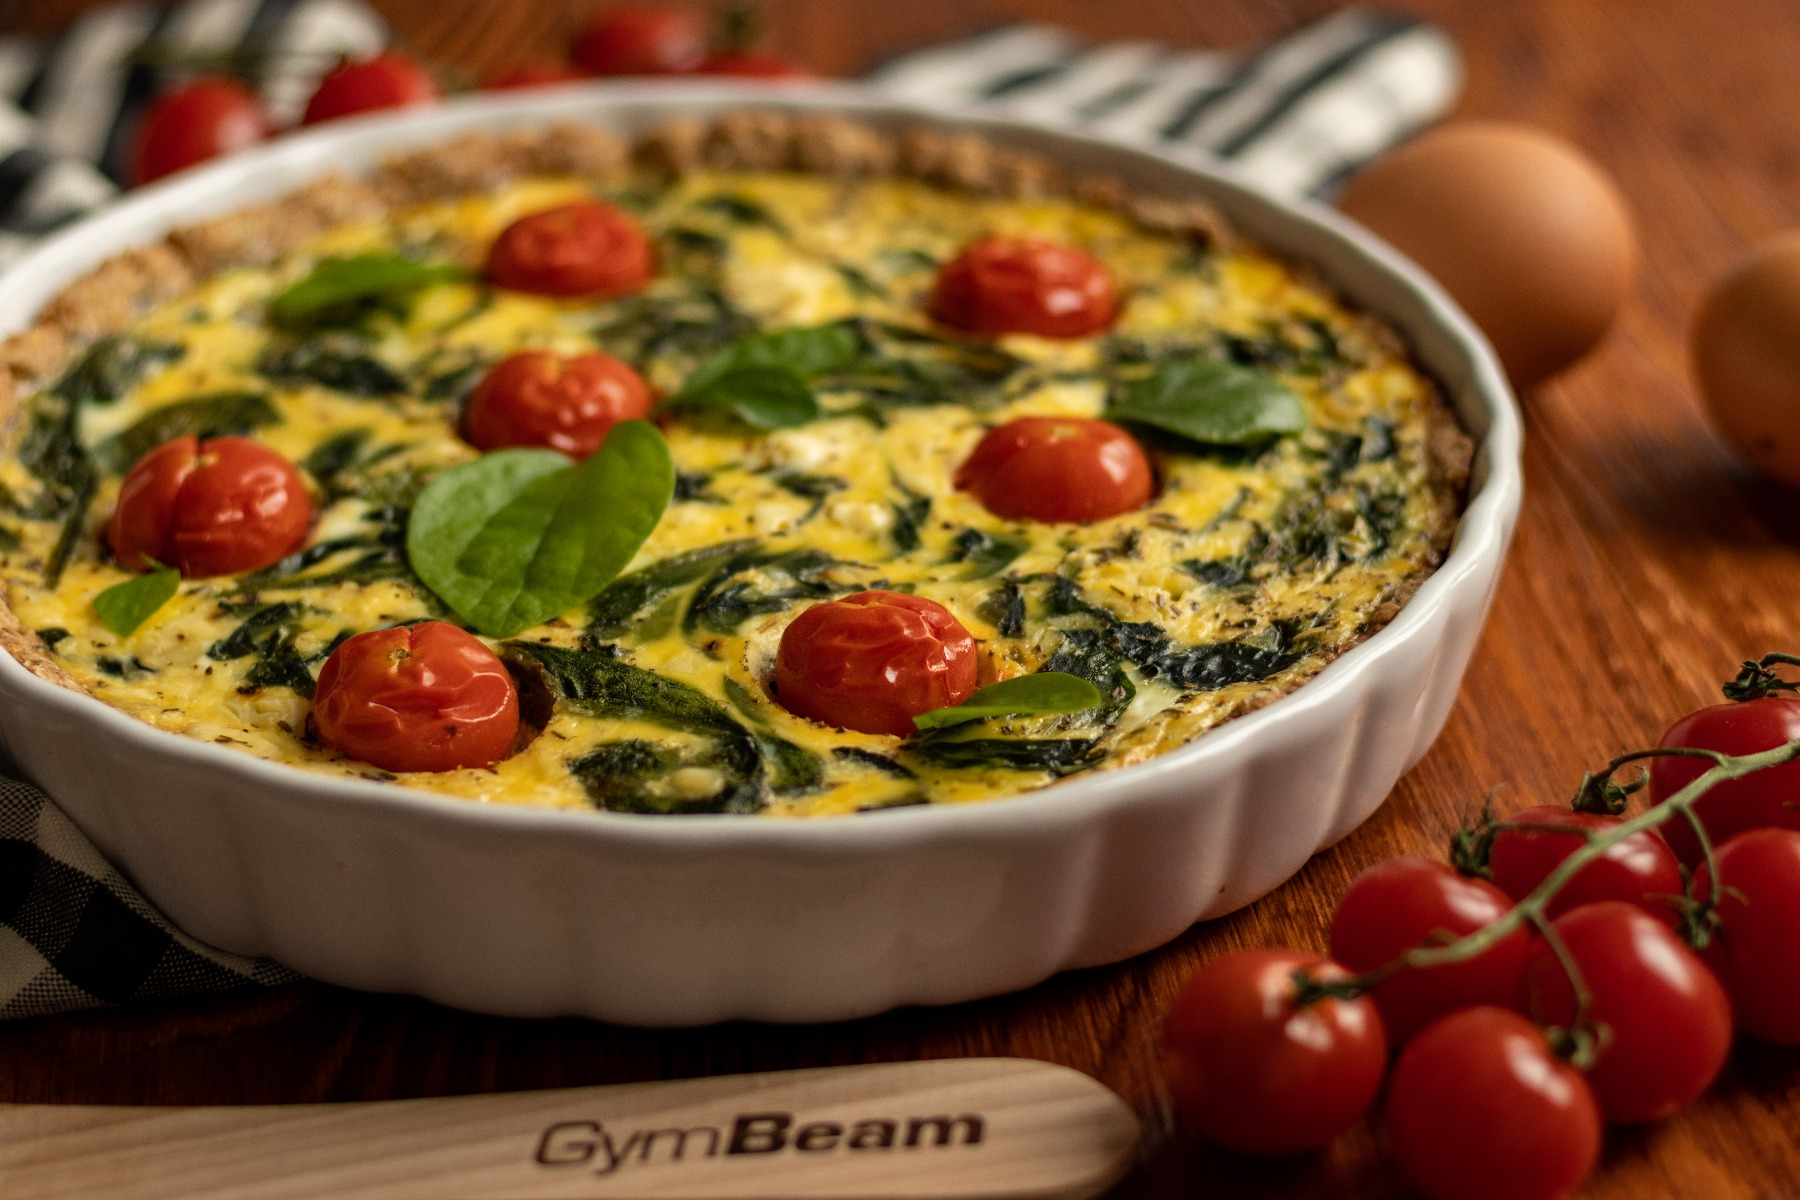 Fitness recept: Quiche od špinata - slana francuska pita